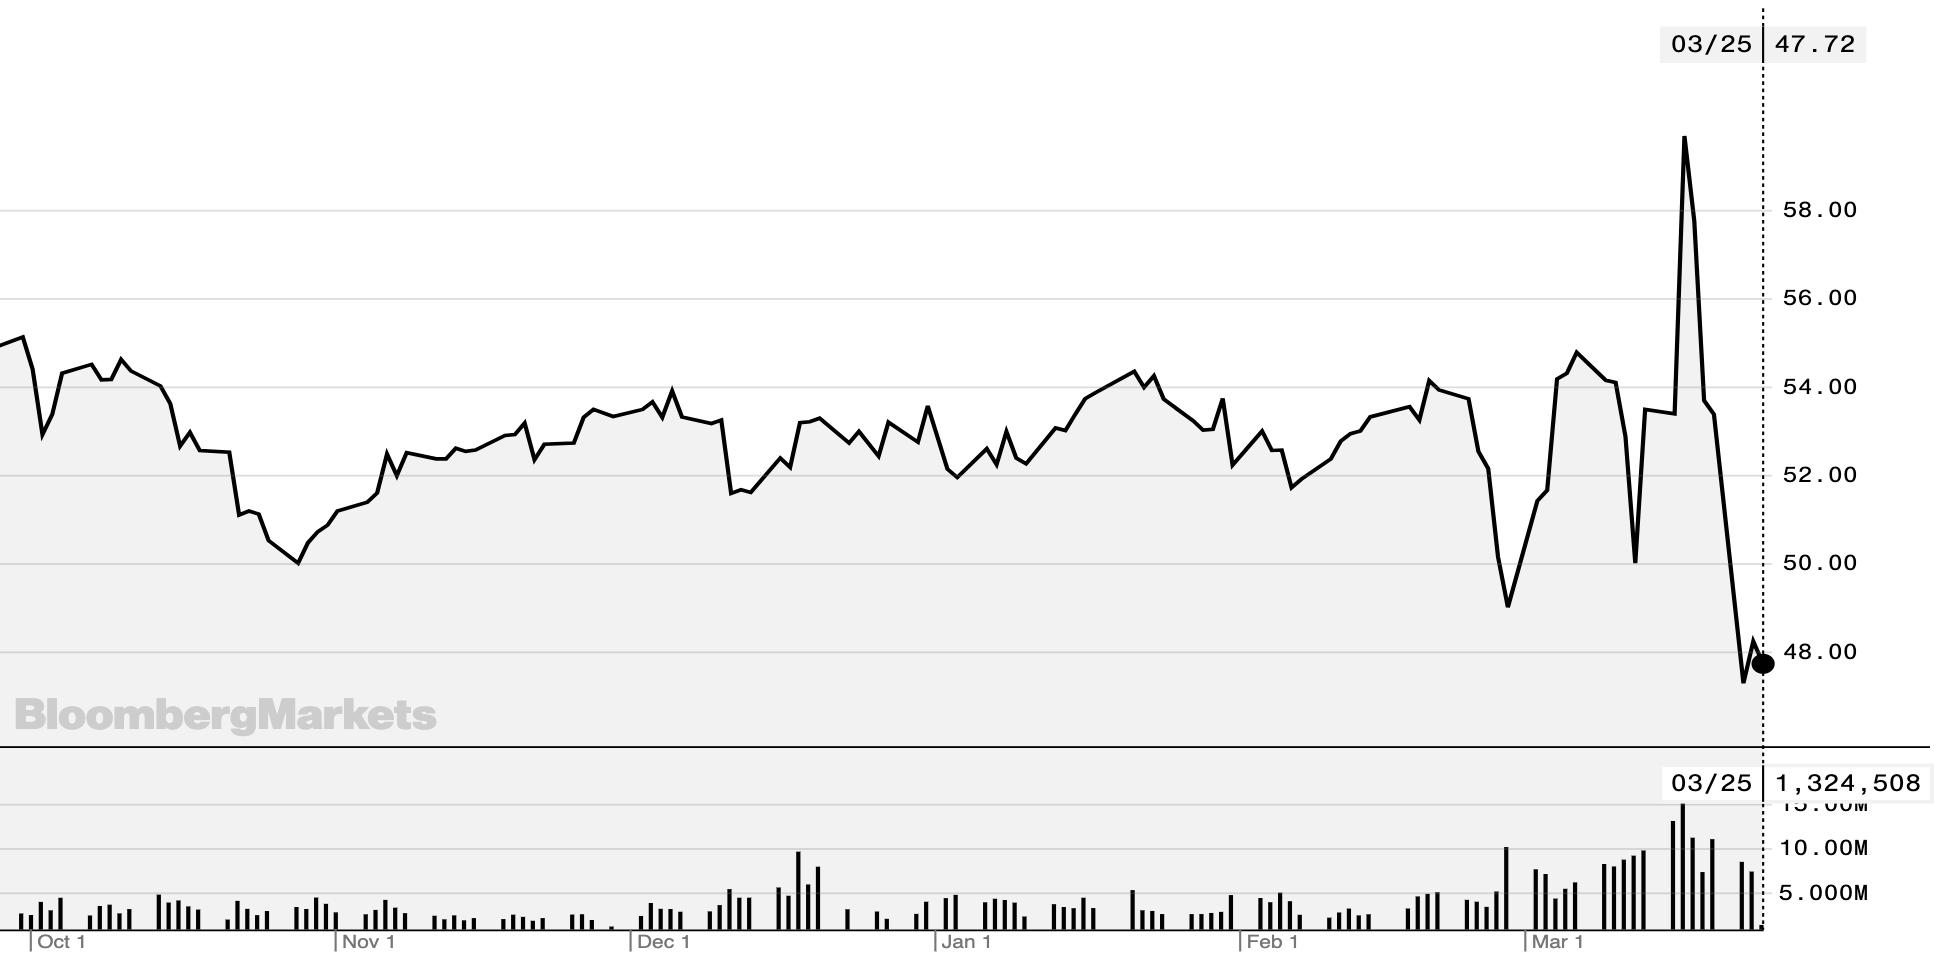 Акции General Mills за последние полгода. Источник: Bloomberg